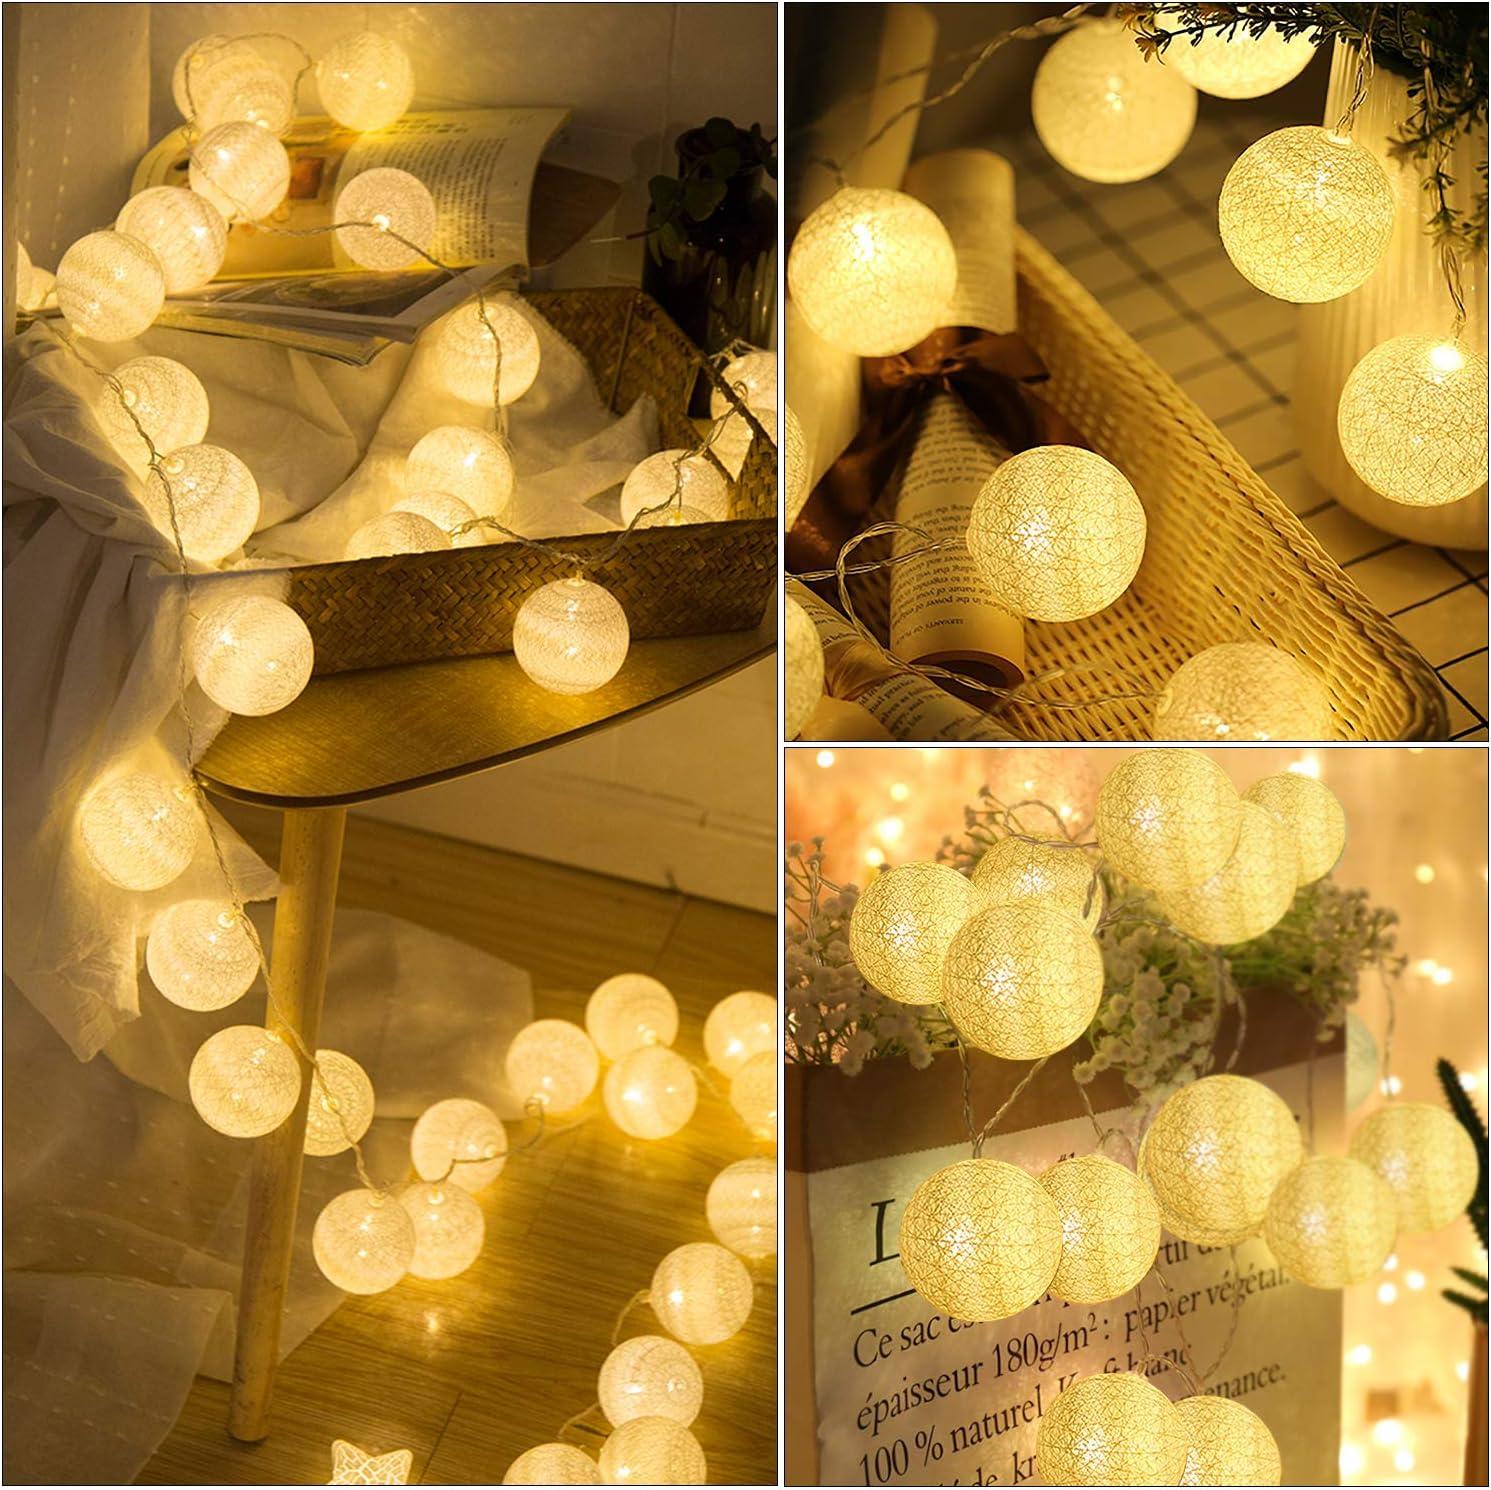 3M 20 LEDs Guirnalda Luminosa de Bolas de algod/ón Cadena de Luces Bolas de Algod/ón Resistente al agua Guirnalda luminosa Bolas de algod/ón LED blanco c/álido Operado con pilas